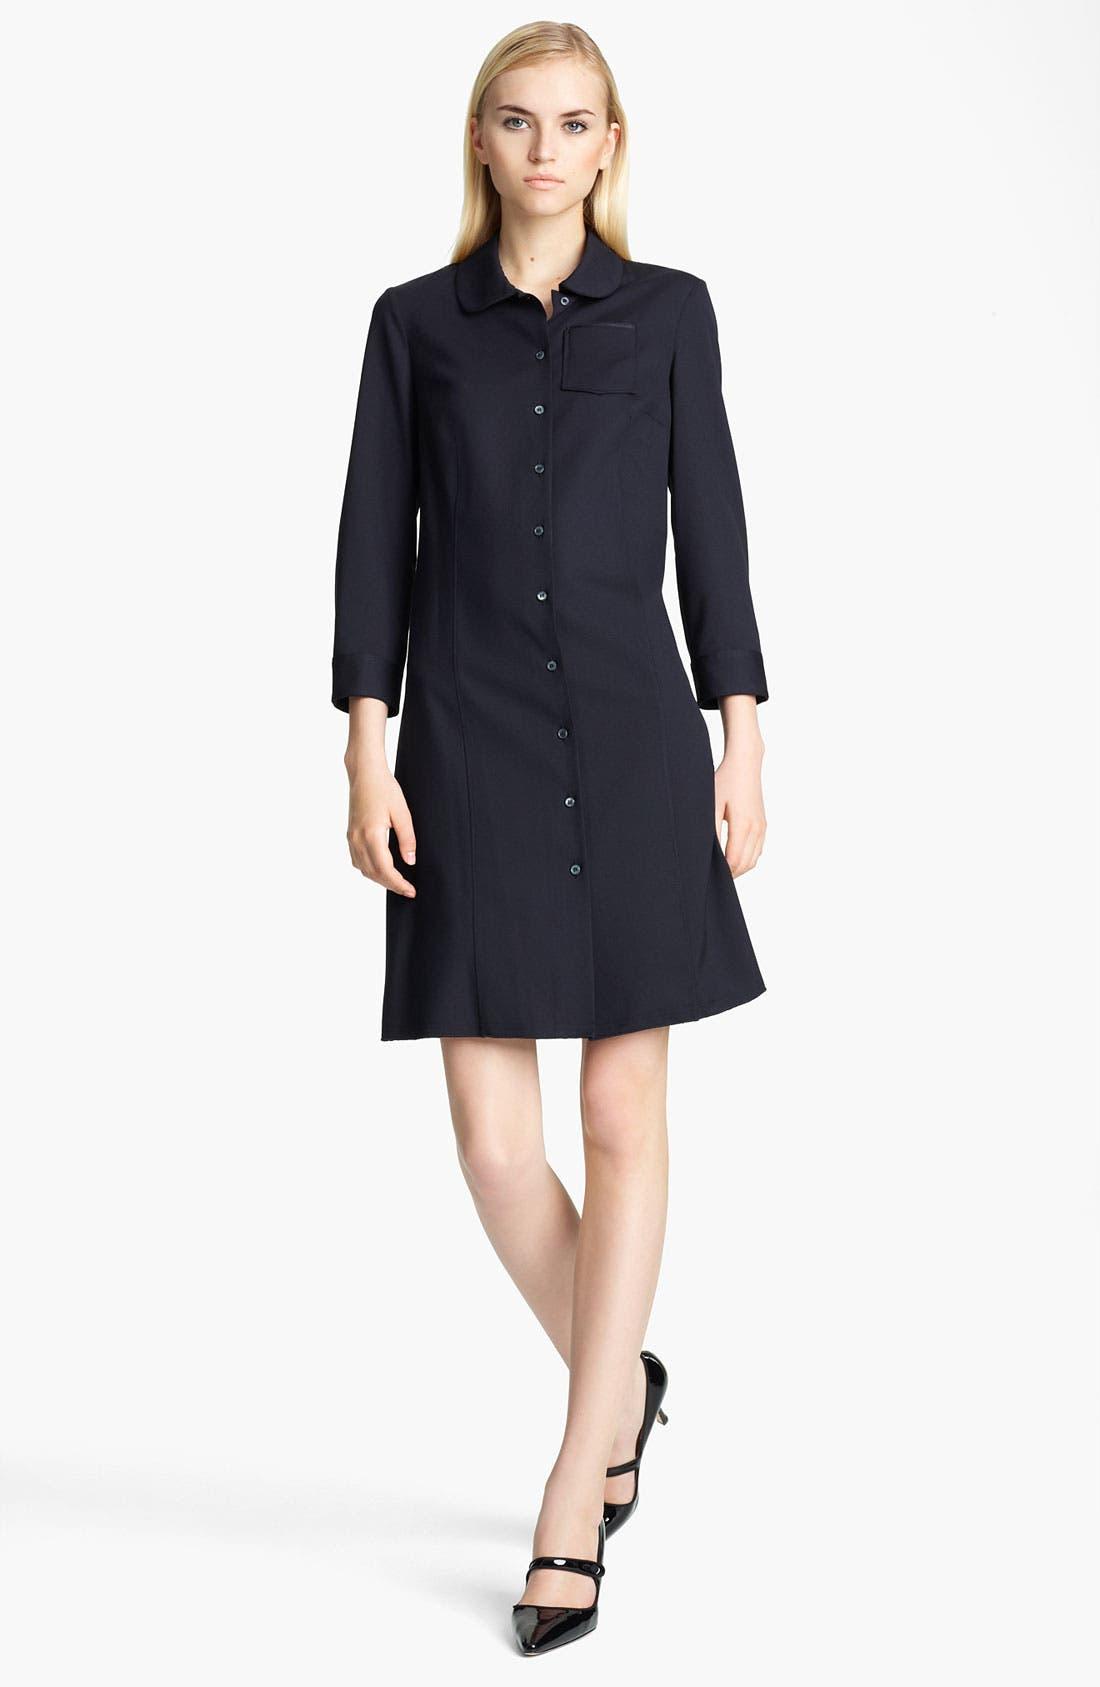 Alternate Image 1 Selected - Jil Sander Navy Stretch Wool Shirtdress